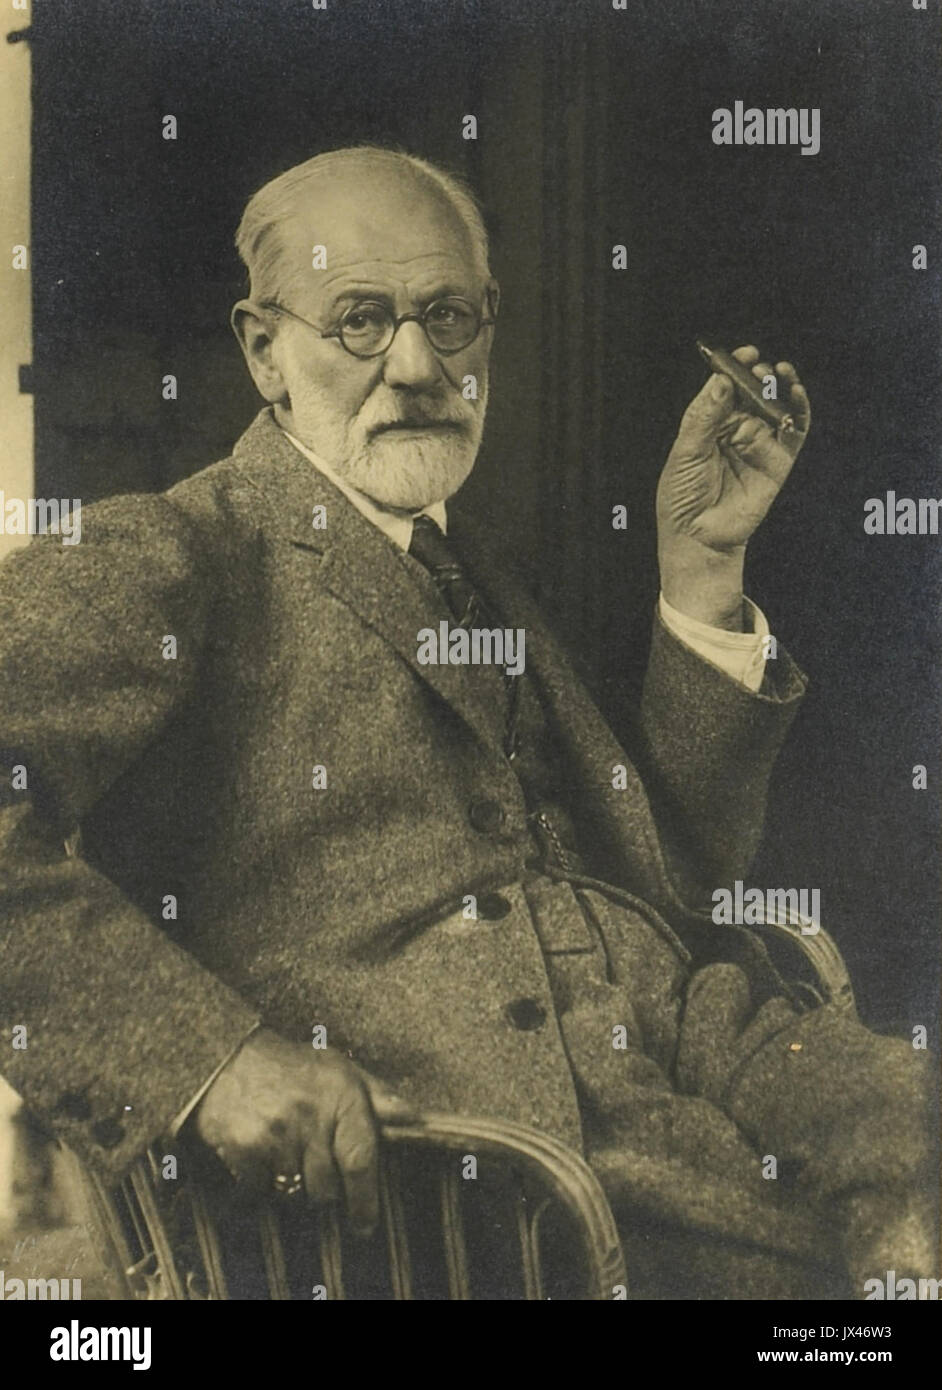 Sigmund Freud by Max Halberstadt - Stock Image